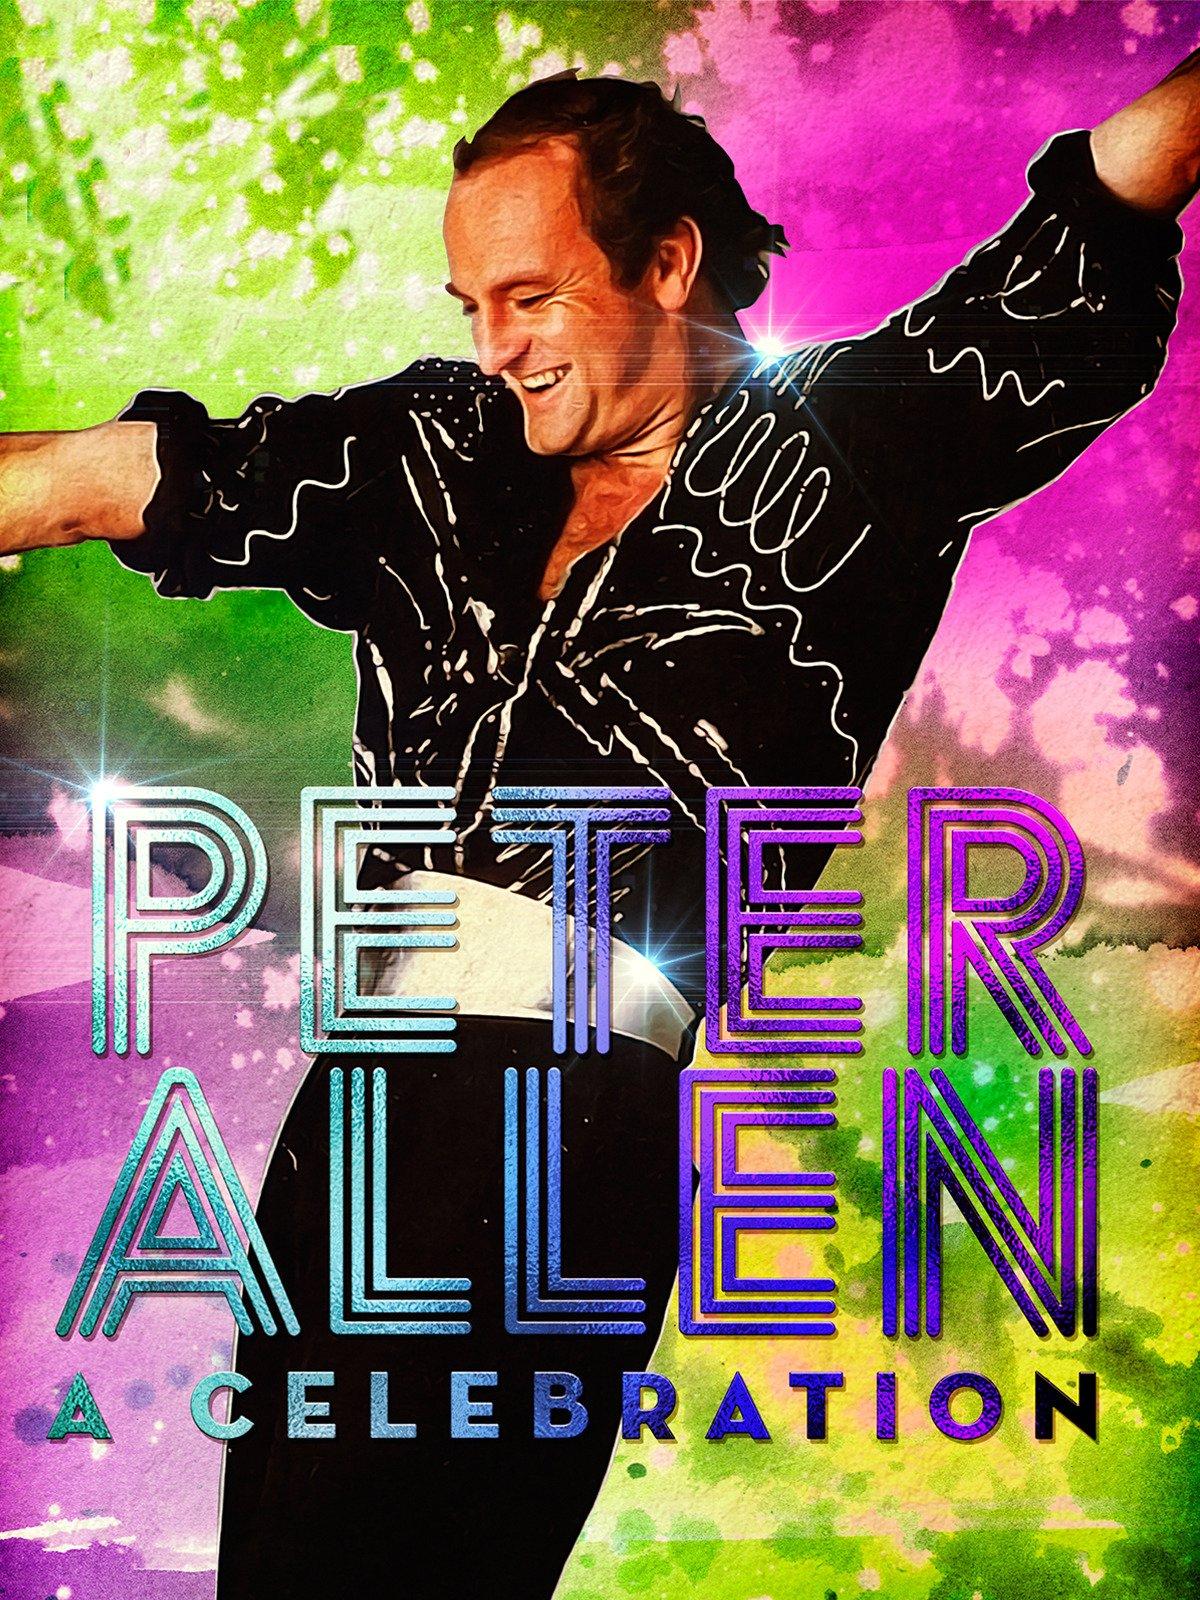 Peter Allen: A Celebration